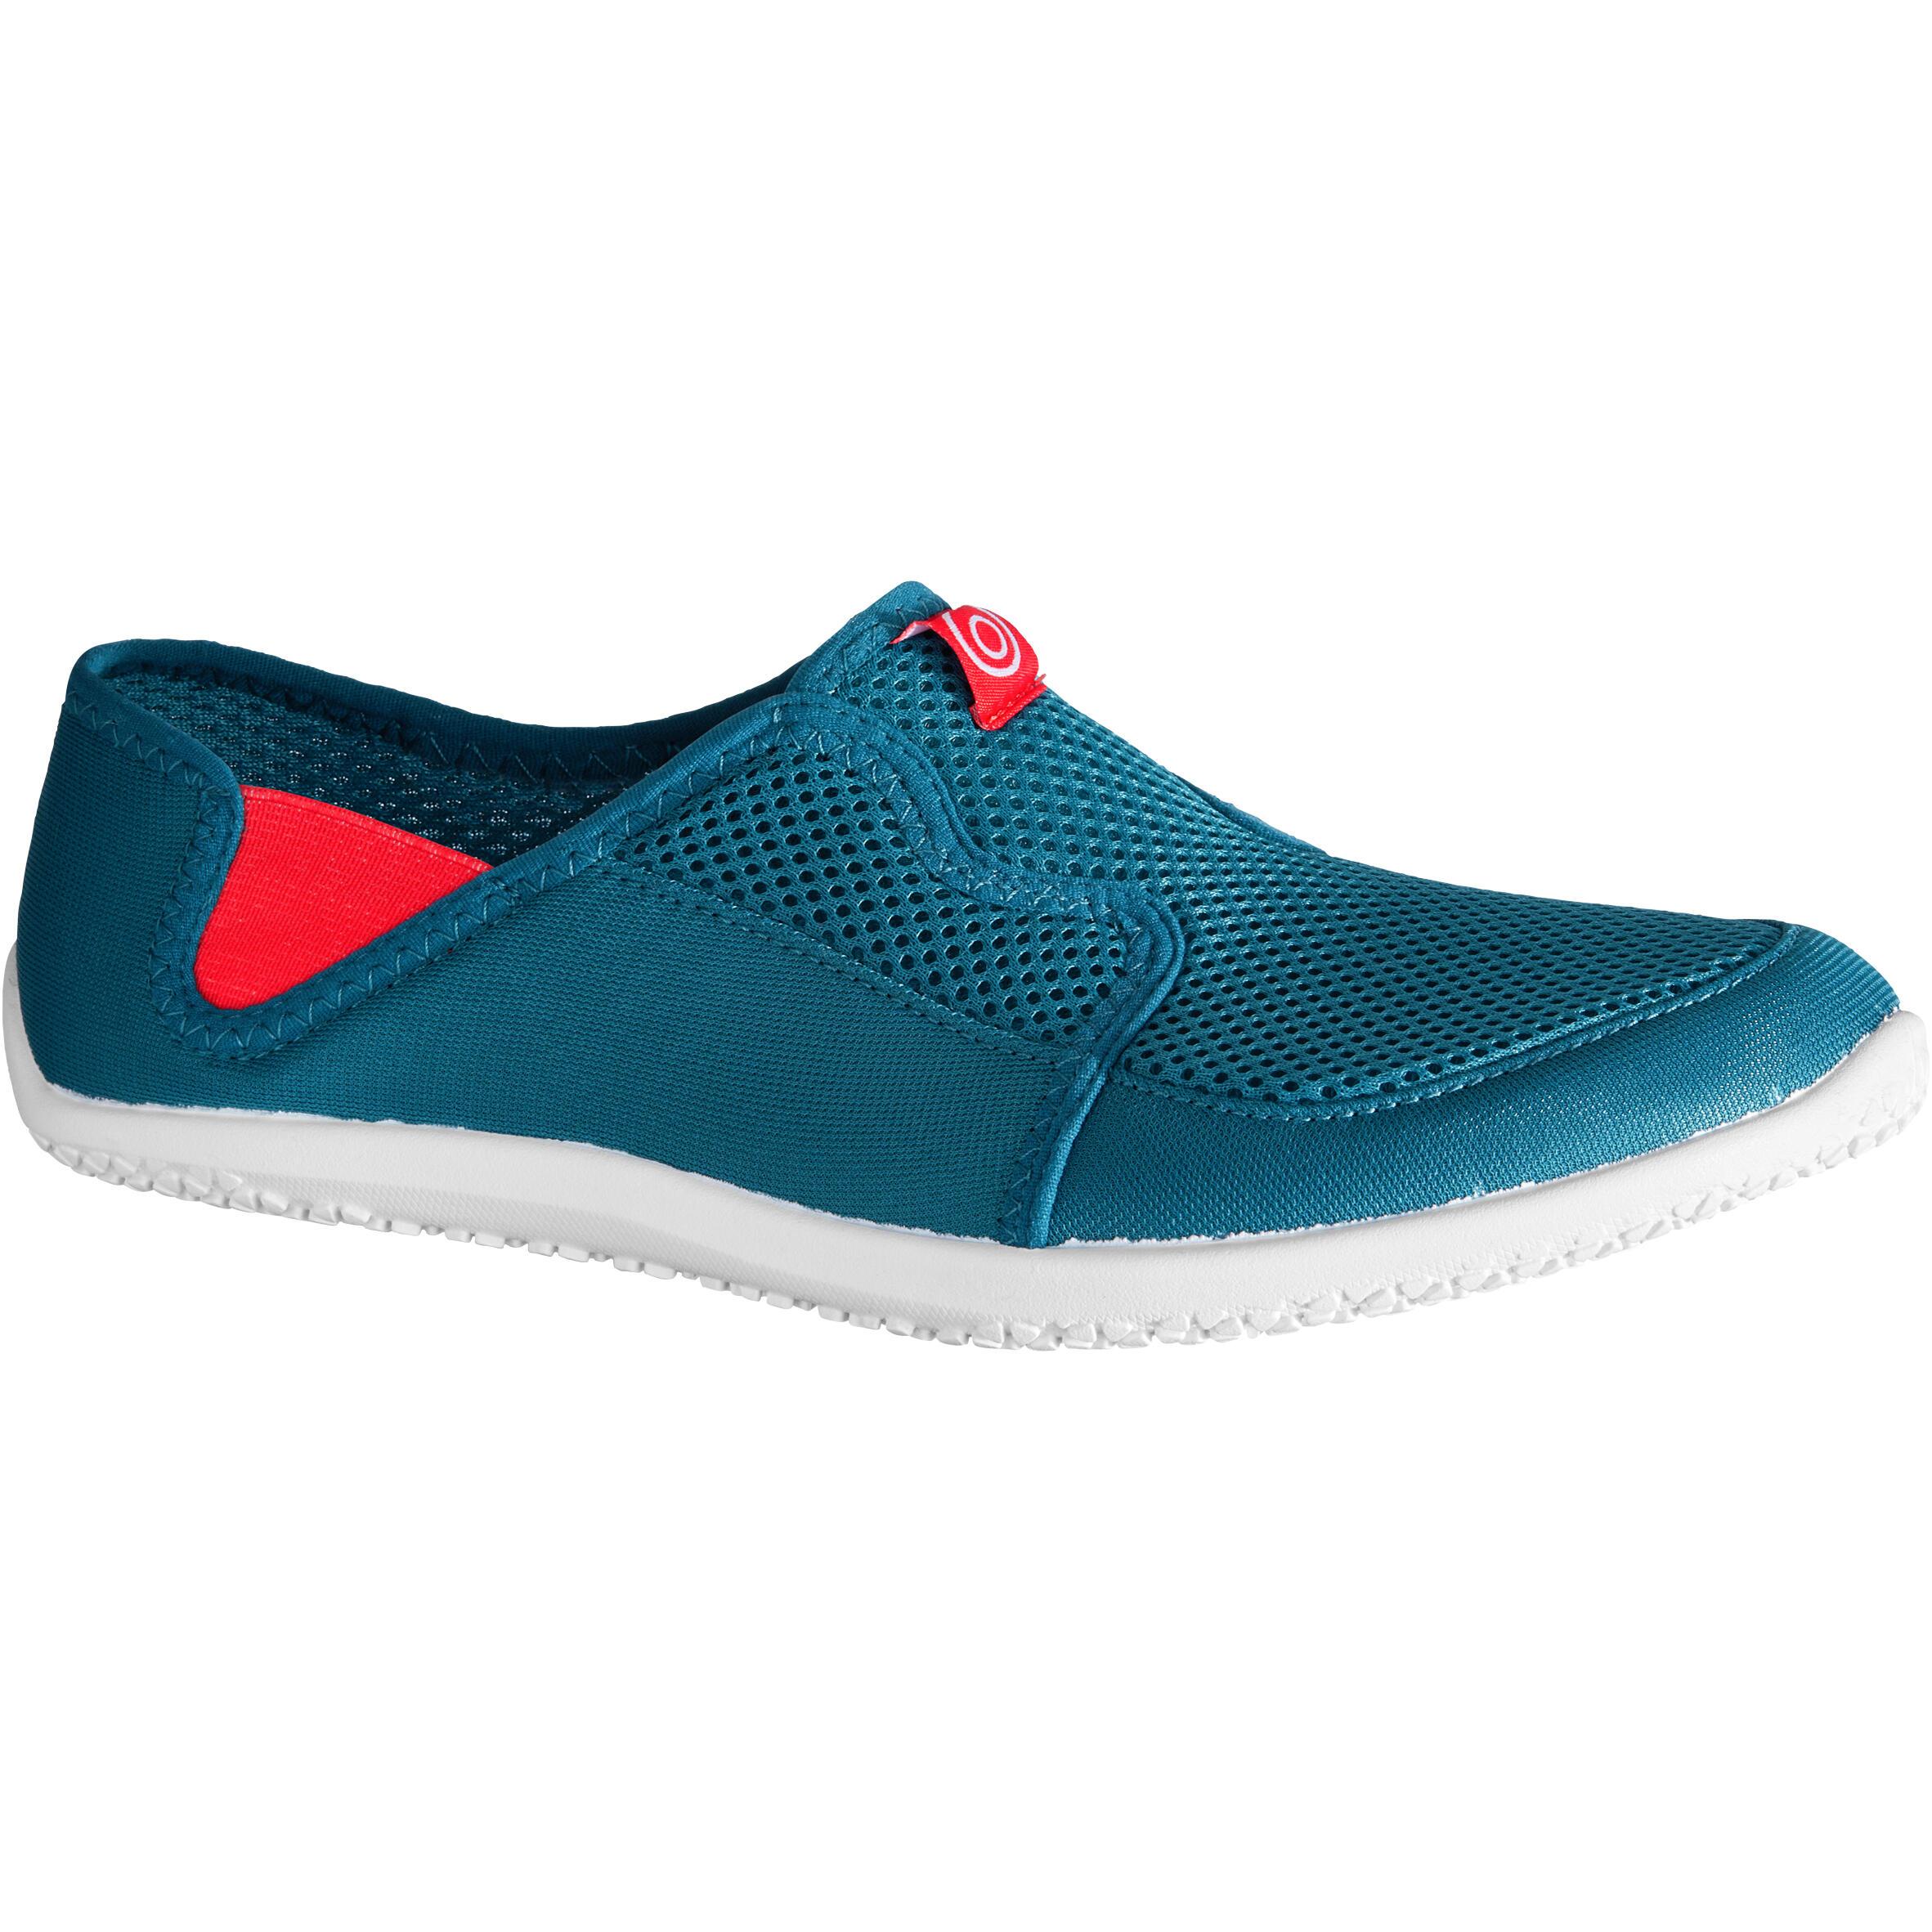 Aquashoes...